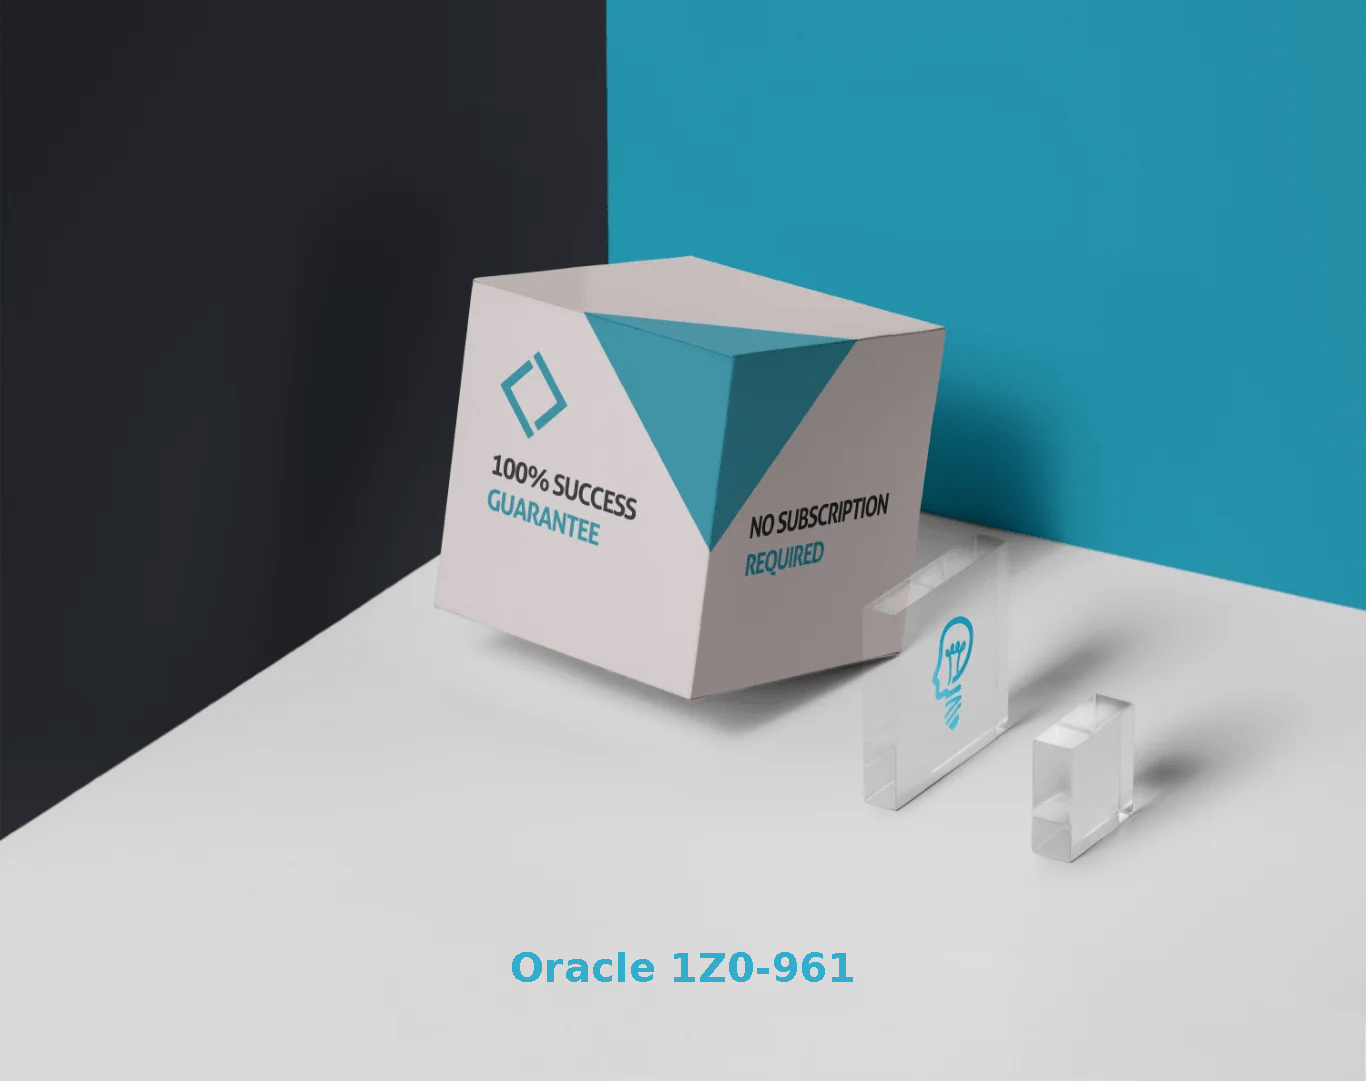 Oracle 1Z0-961 Exams